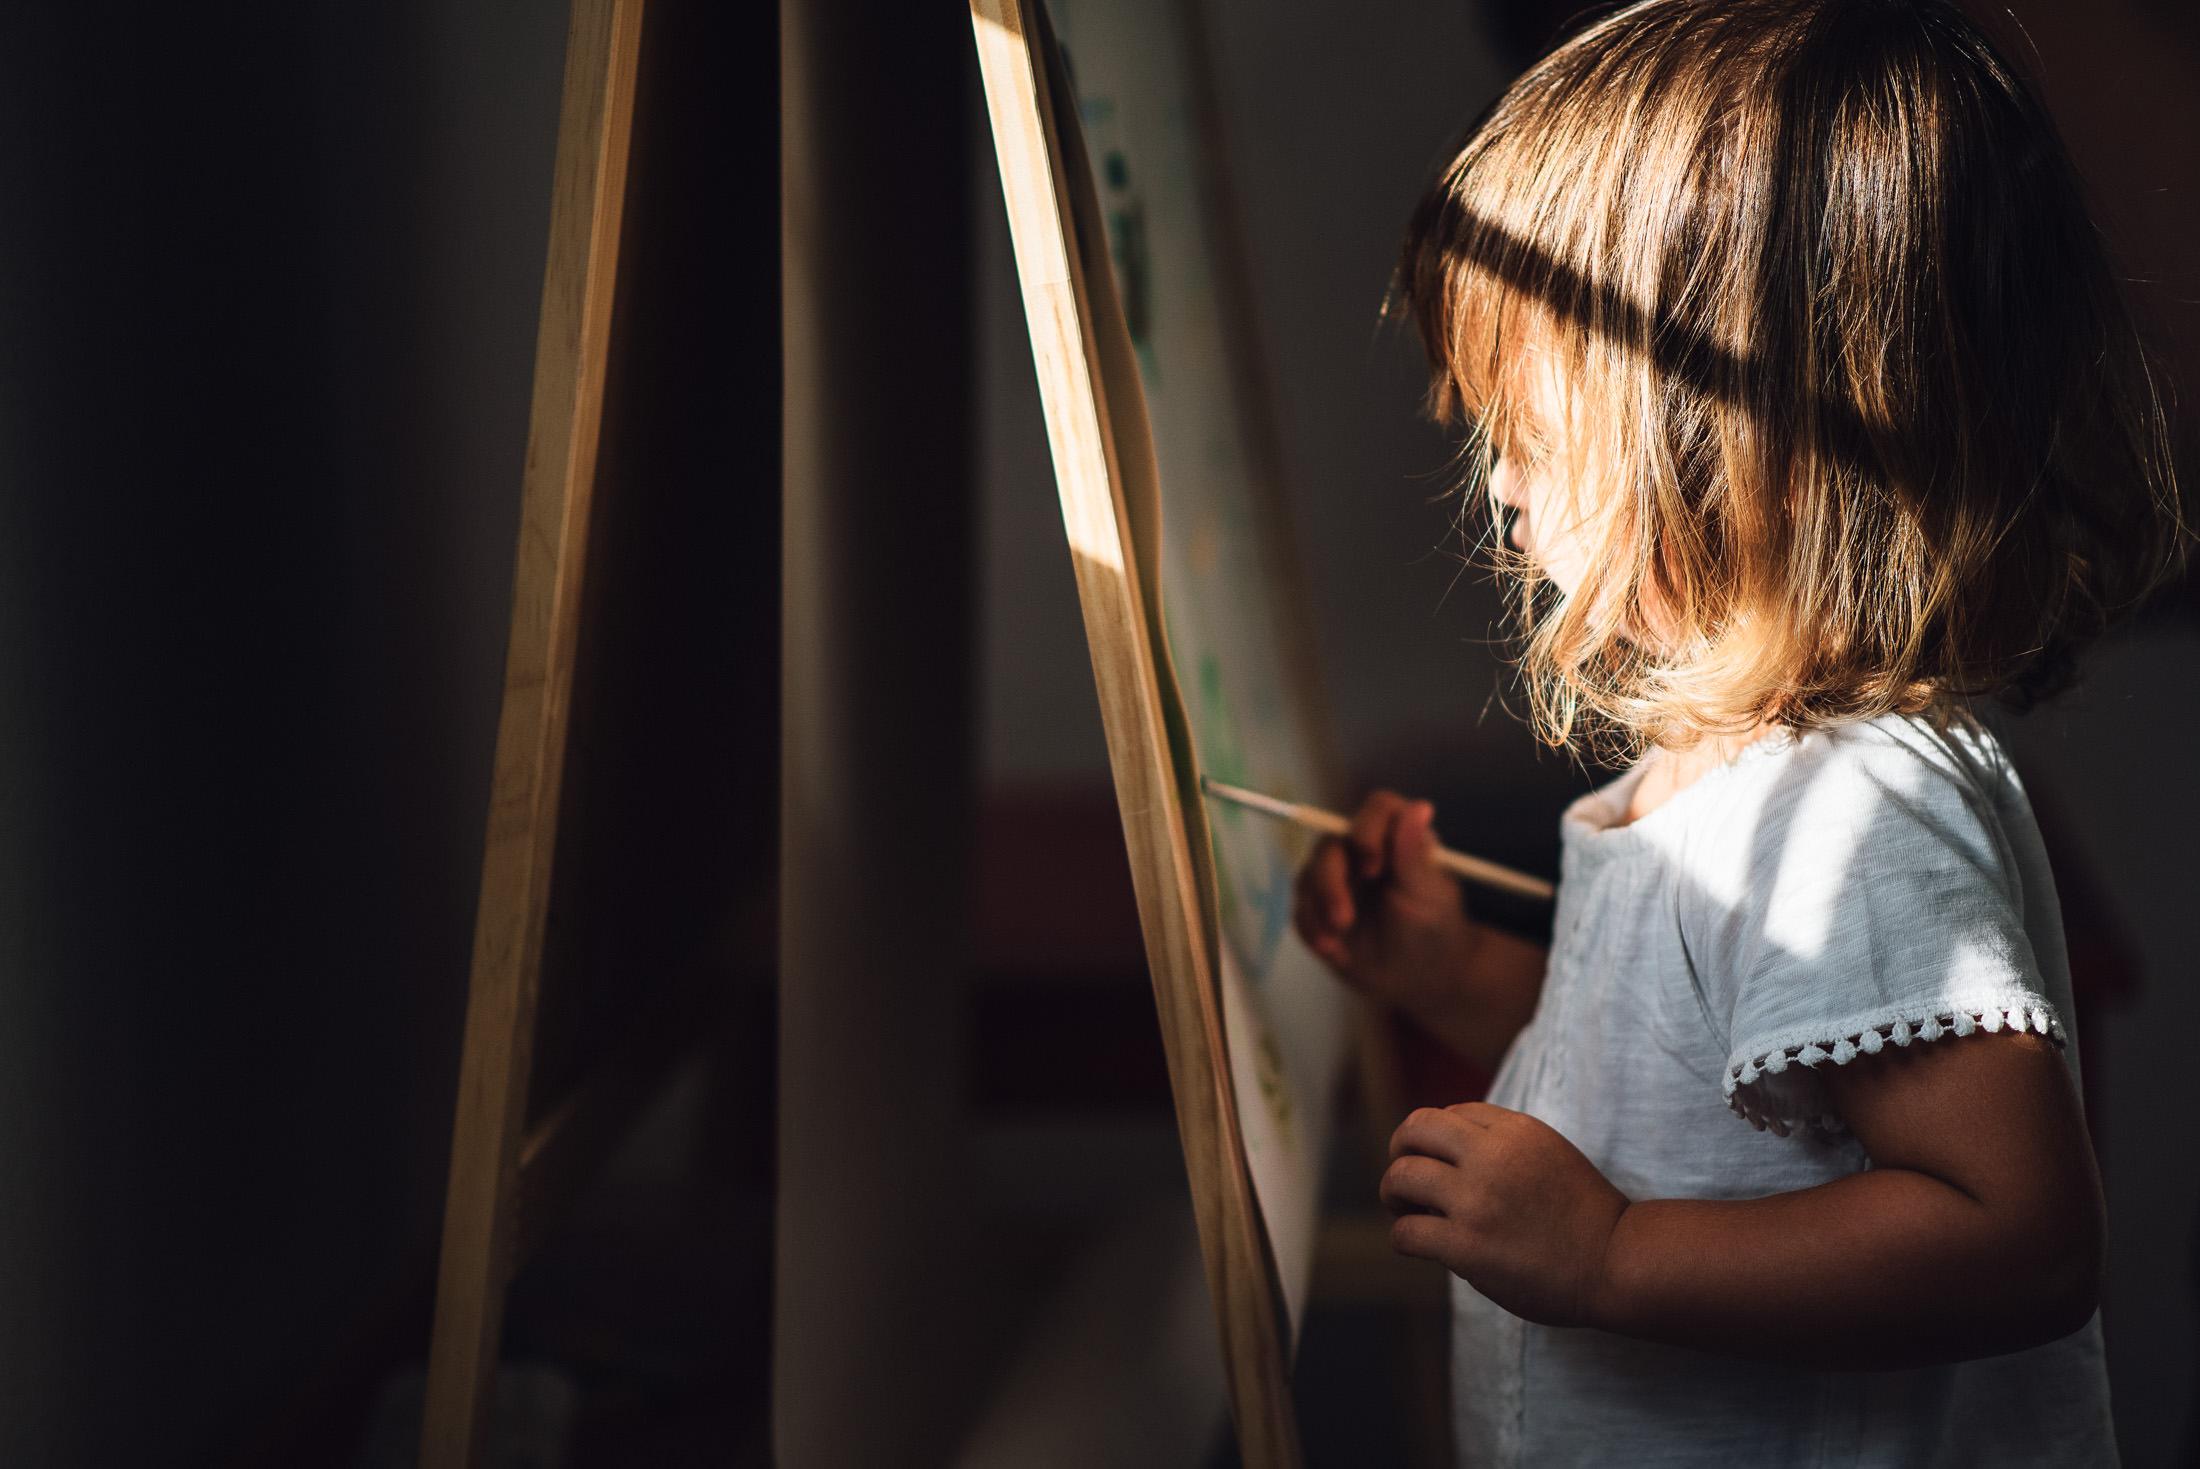 une petite fille peint